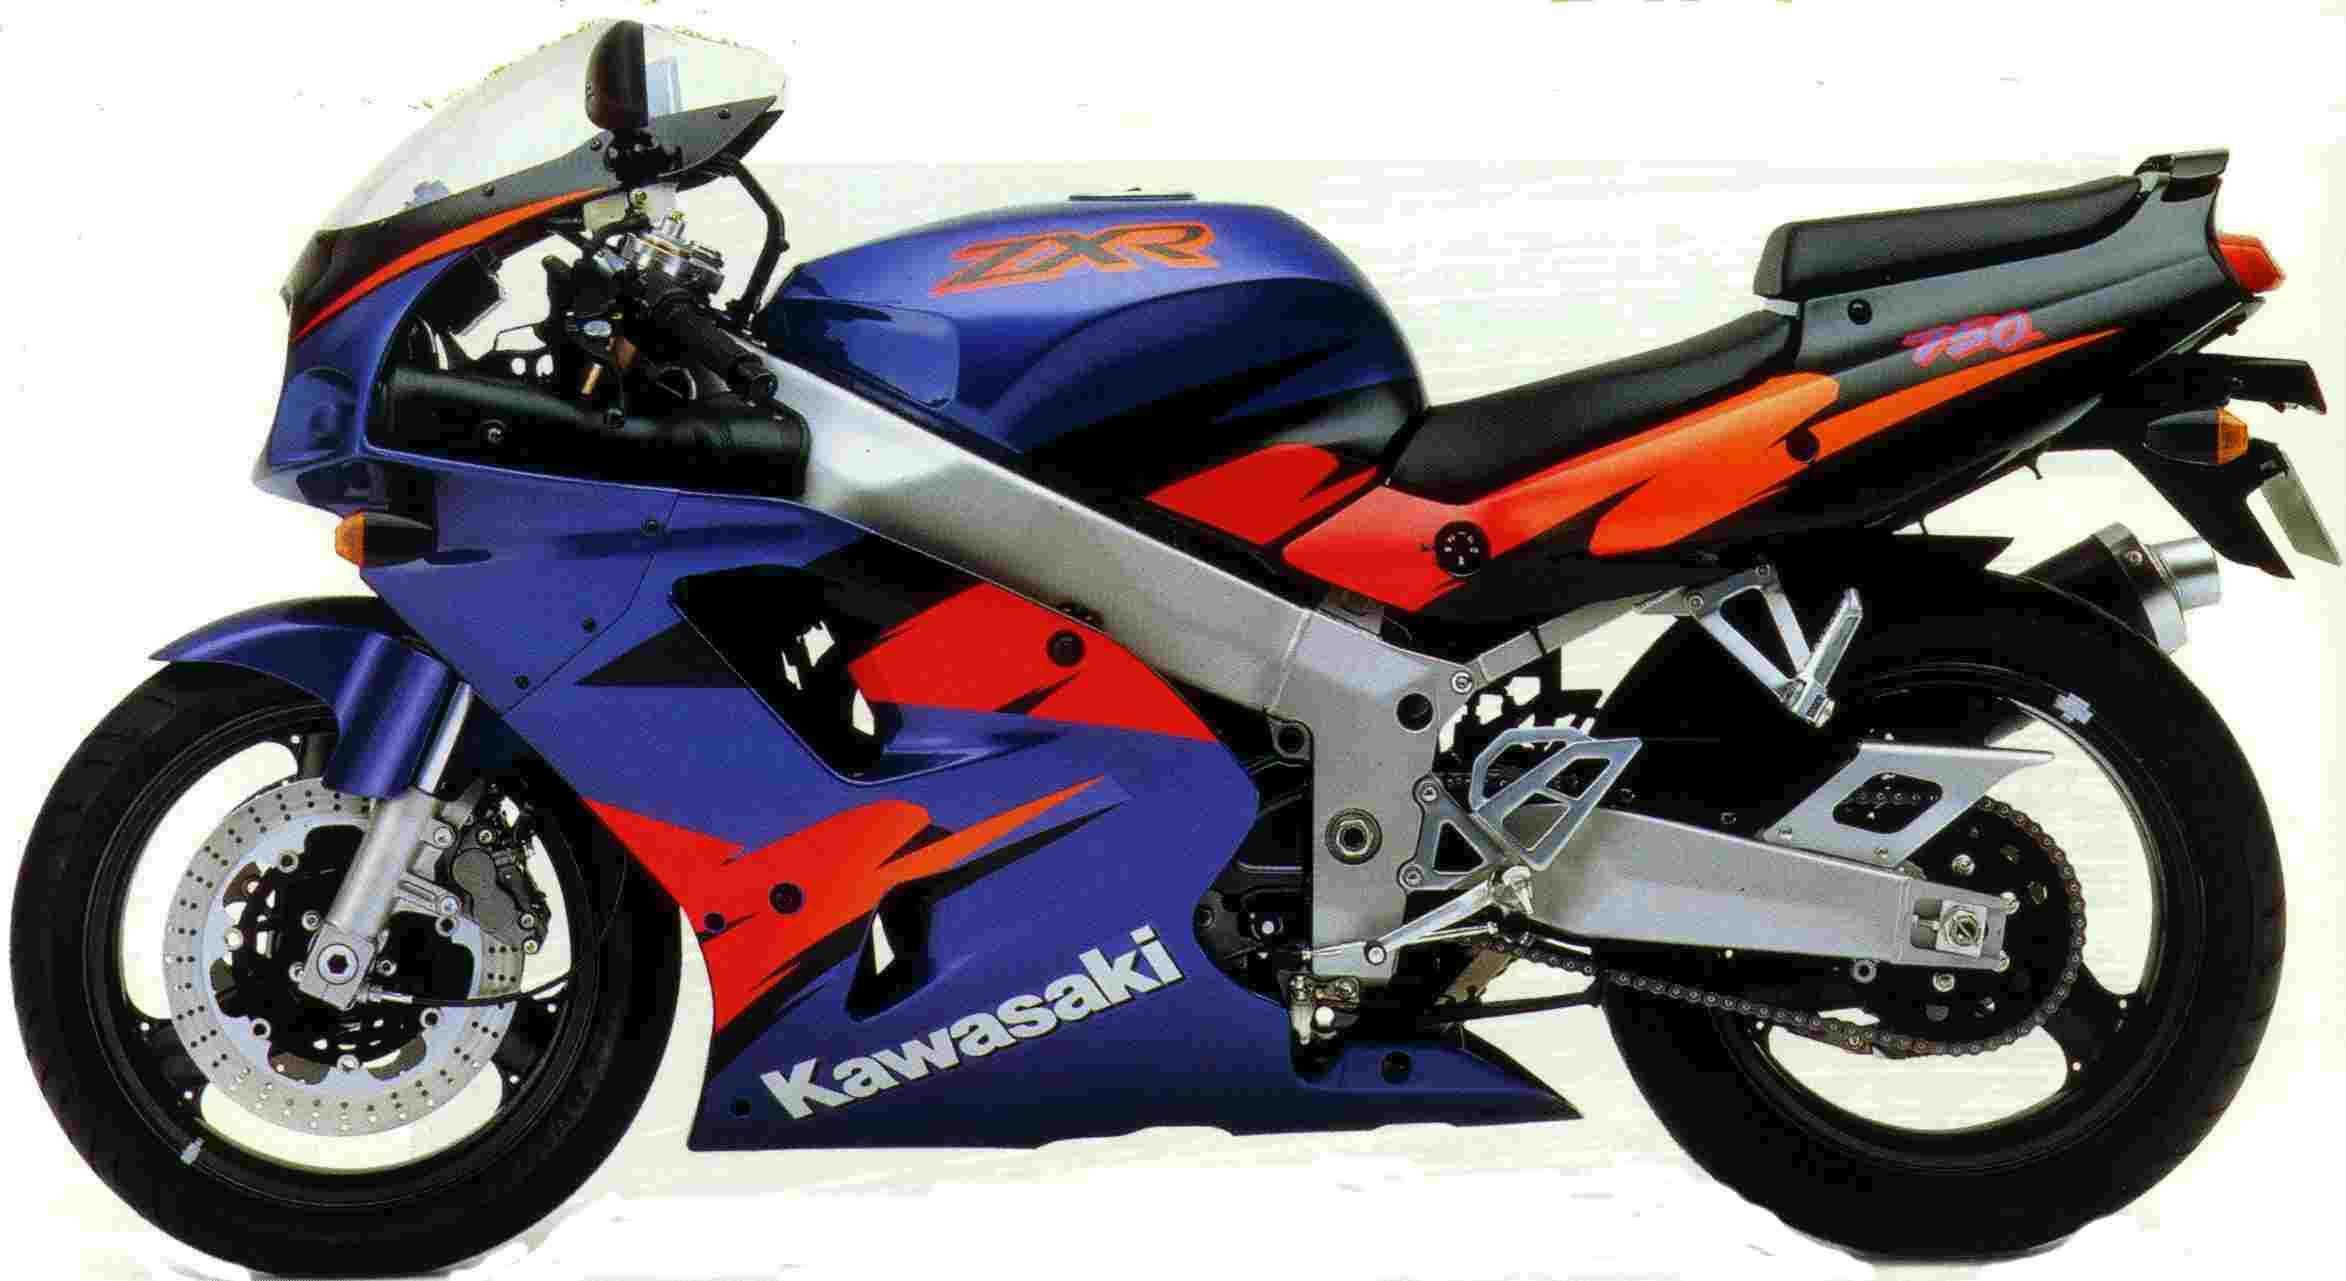 BikePics - 1984 Kawasaki GPZ 750 Home Page on BikePics.Com